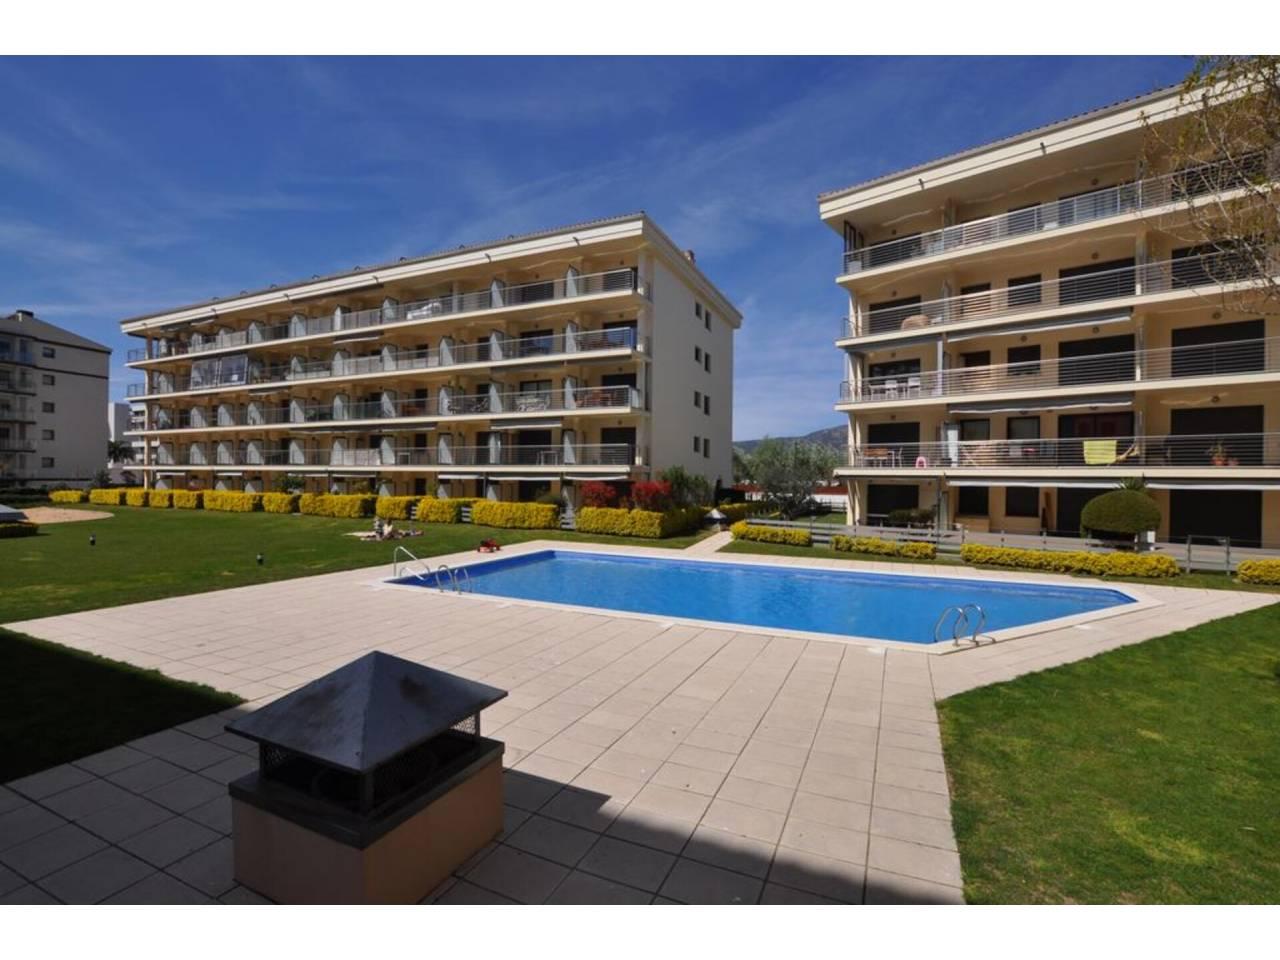 008703 - Appartement en location annuelle à Santa Margarita ( Roses)